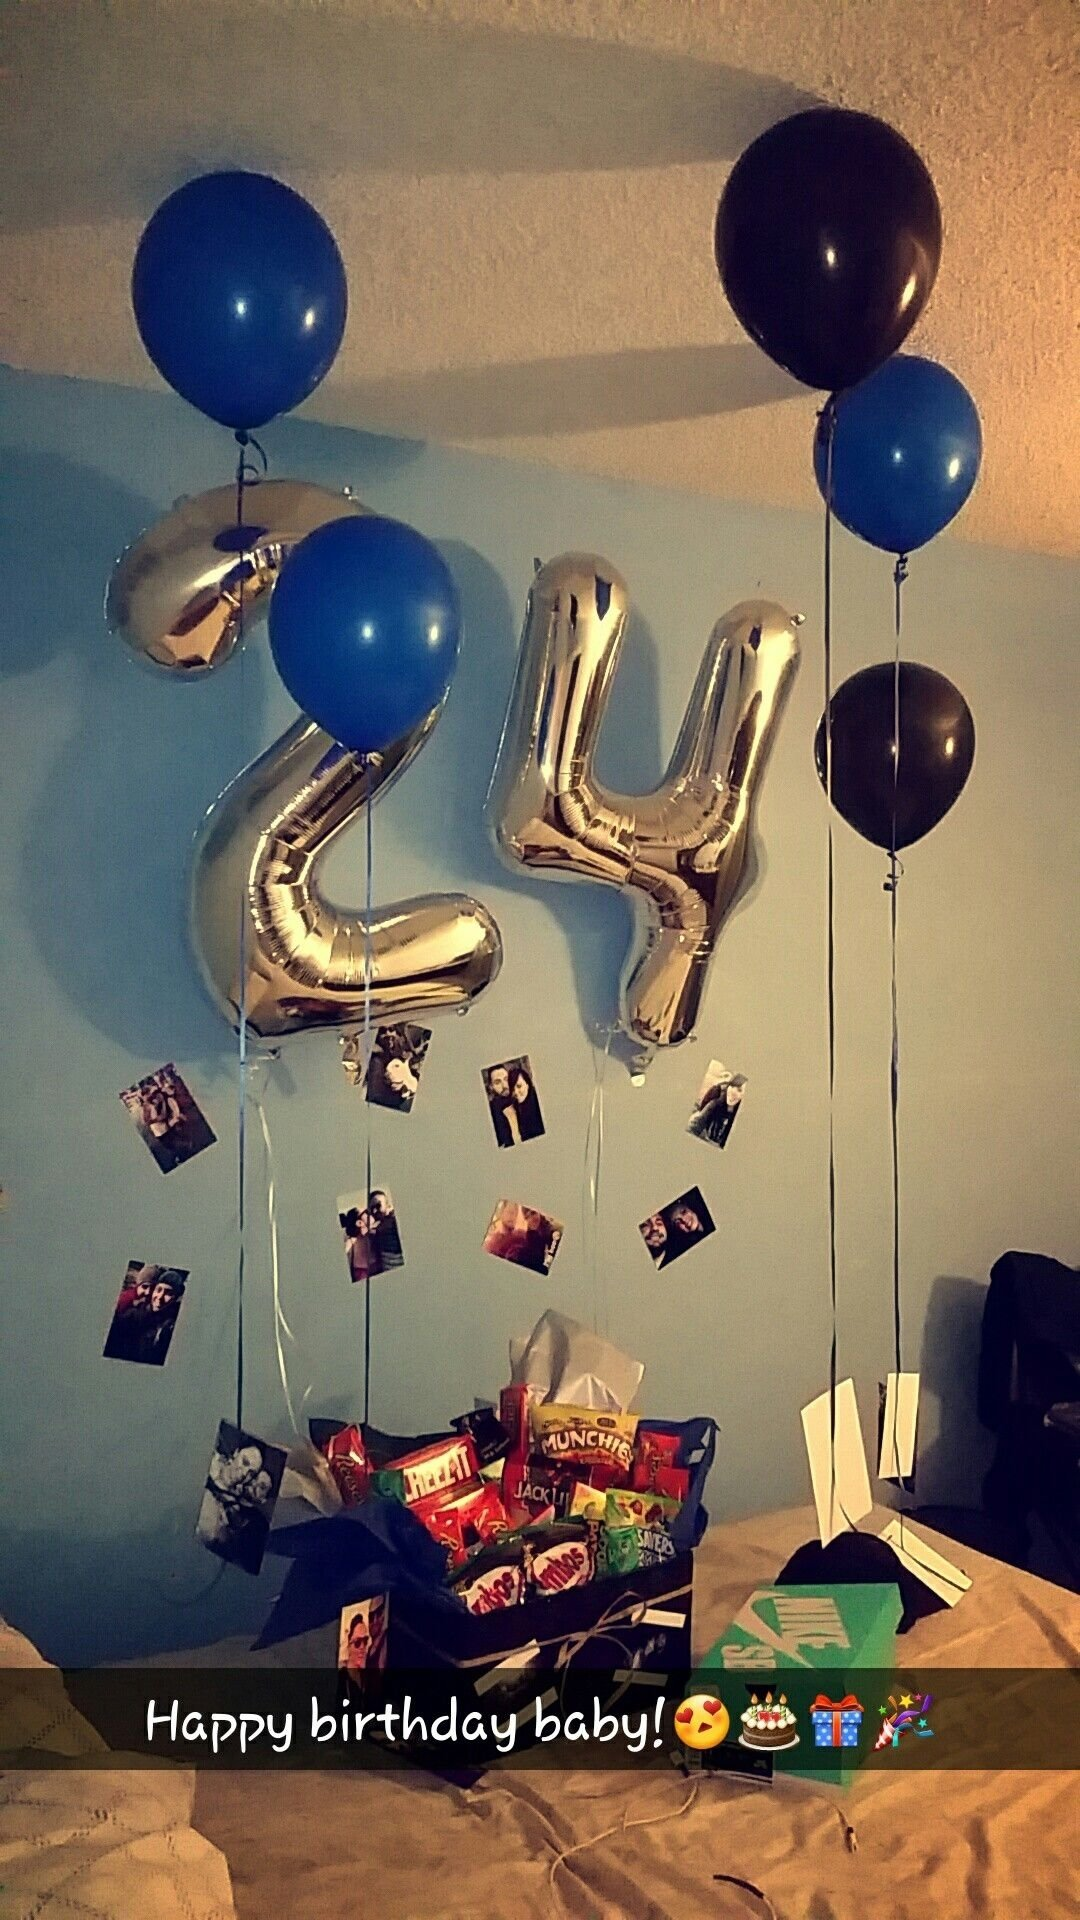 10 Lovely Surprise Birthday Ideas For Her His Boyfriend Gift 9